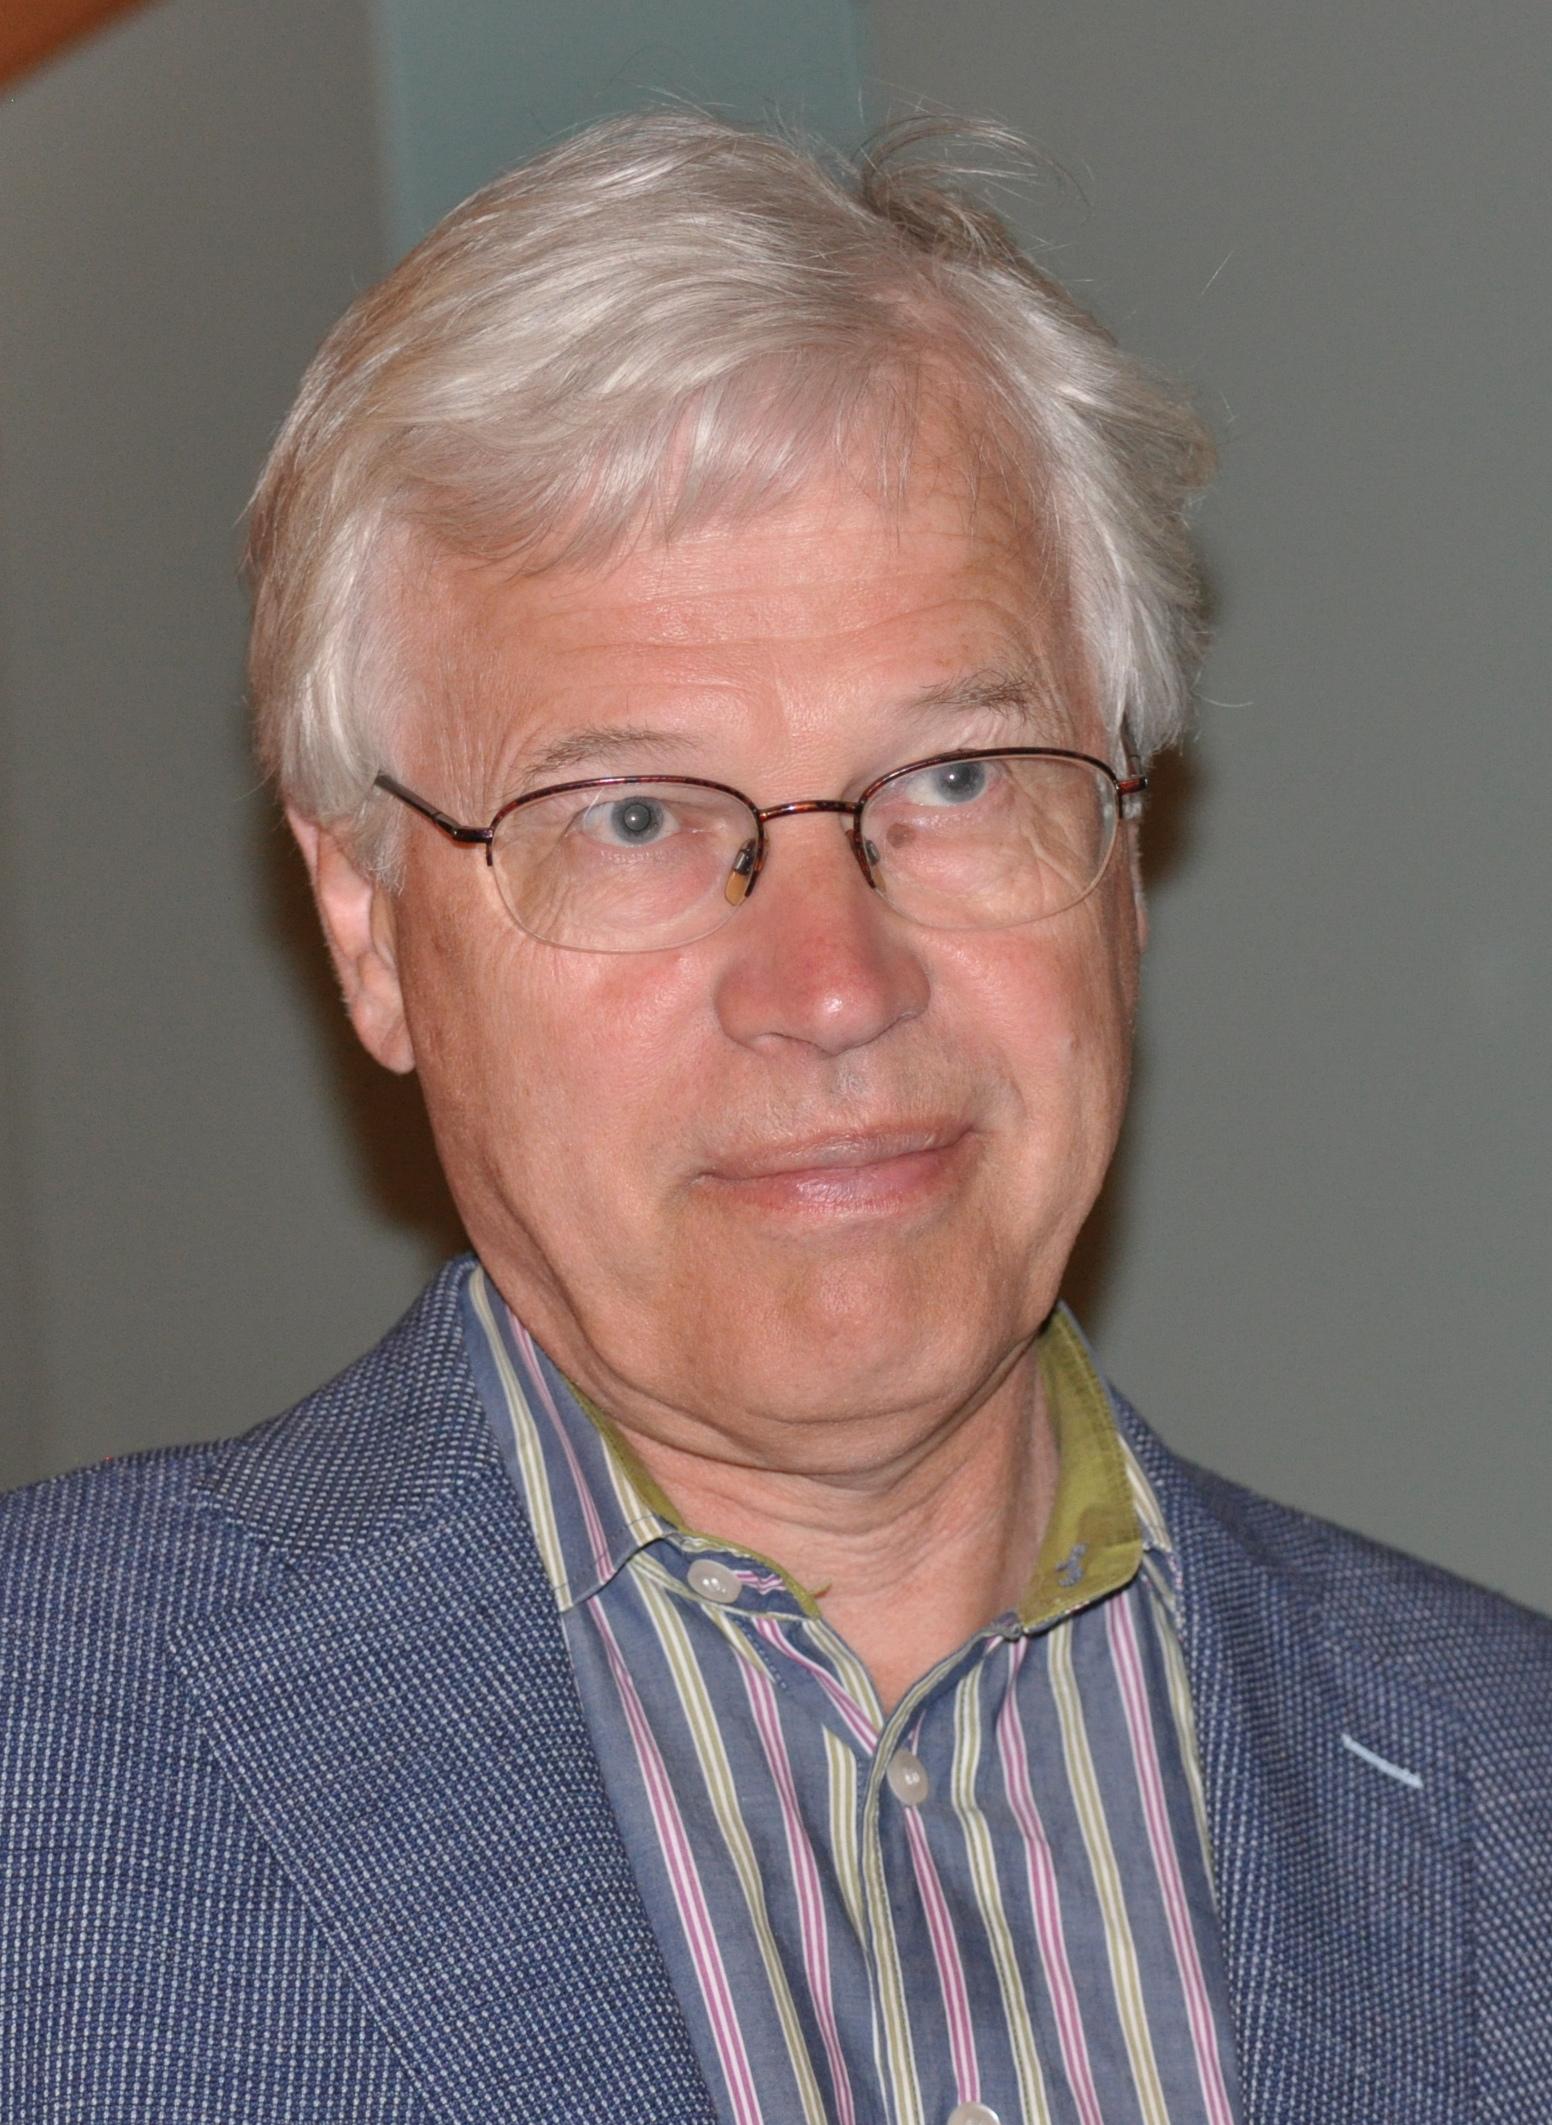 Bengt Holmström, Photo: Soppakanuuna (CC BY-SA 4.0)